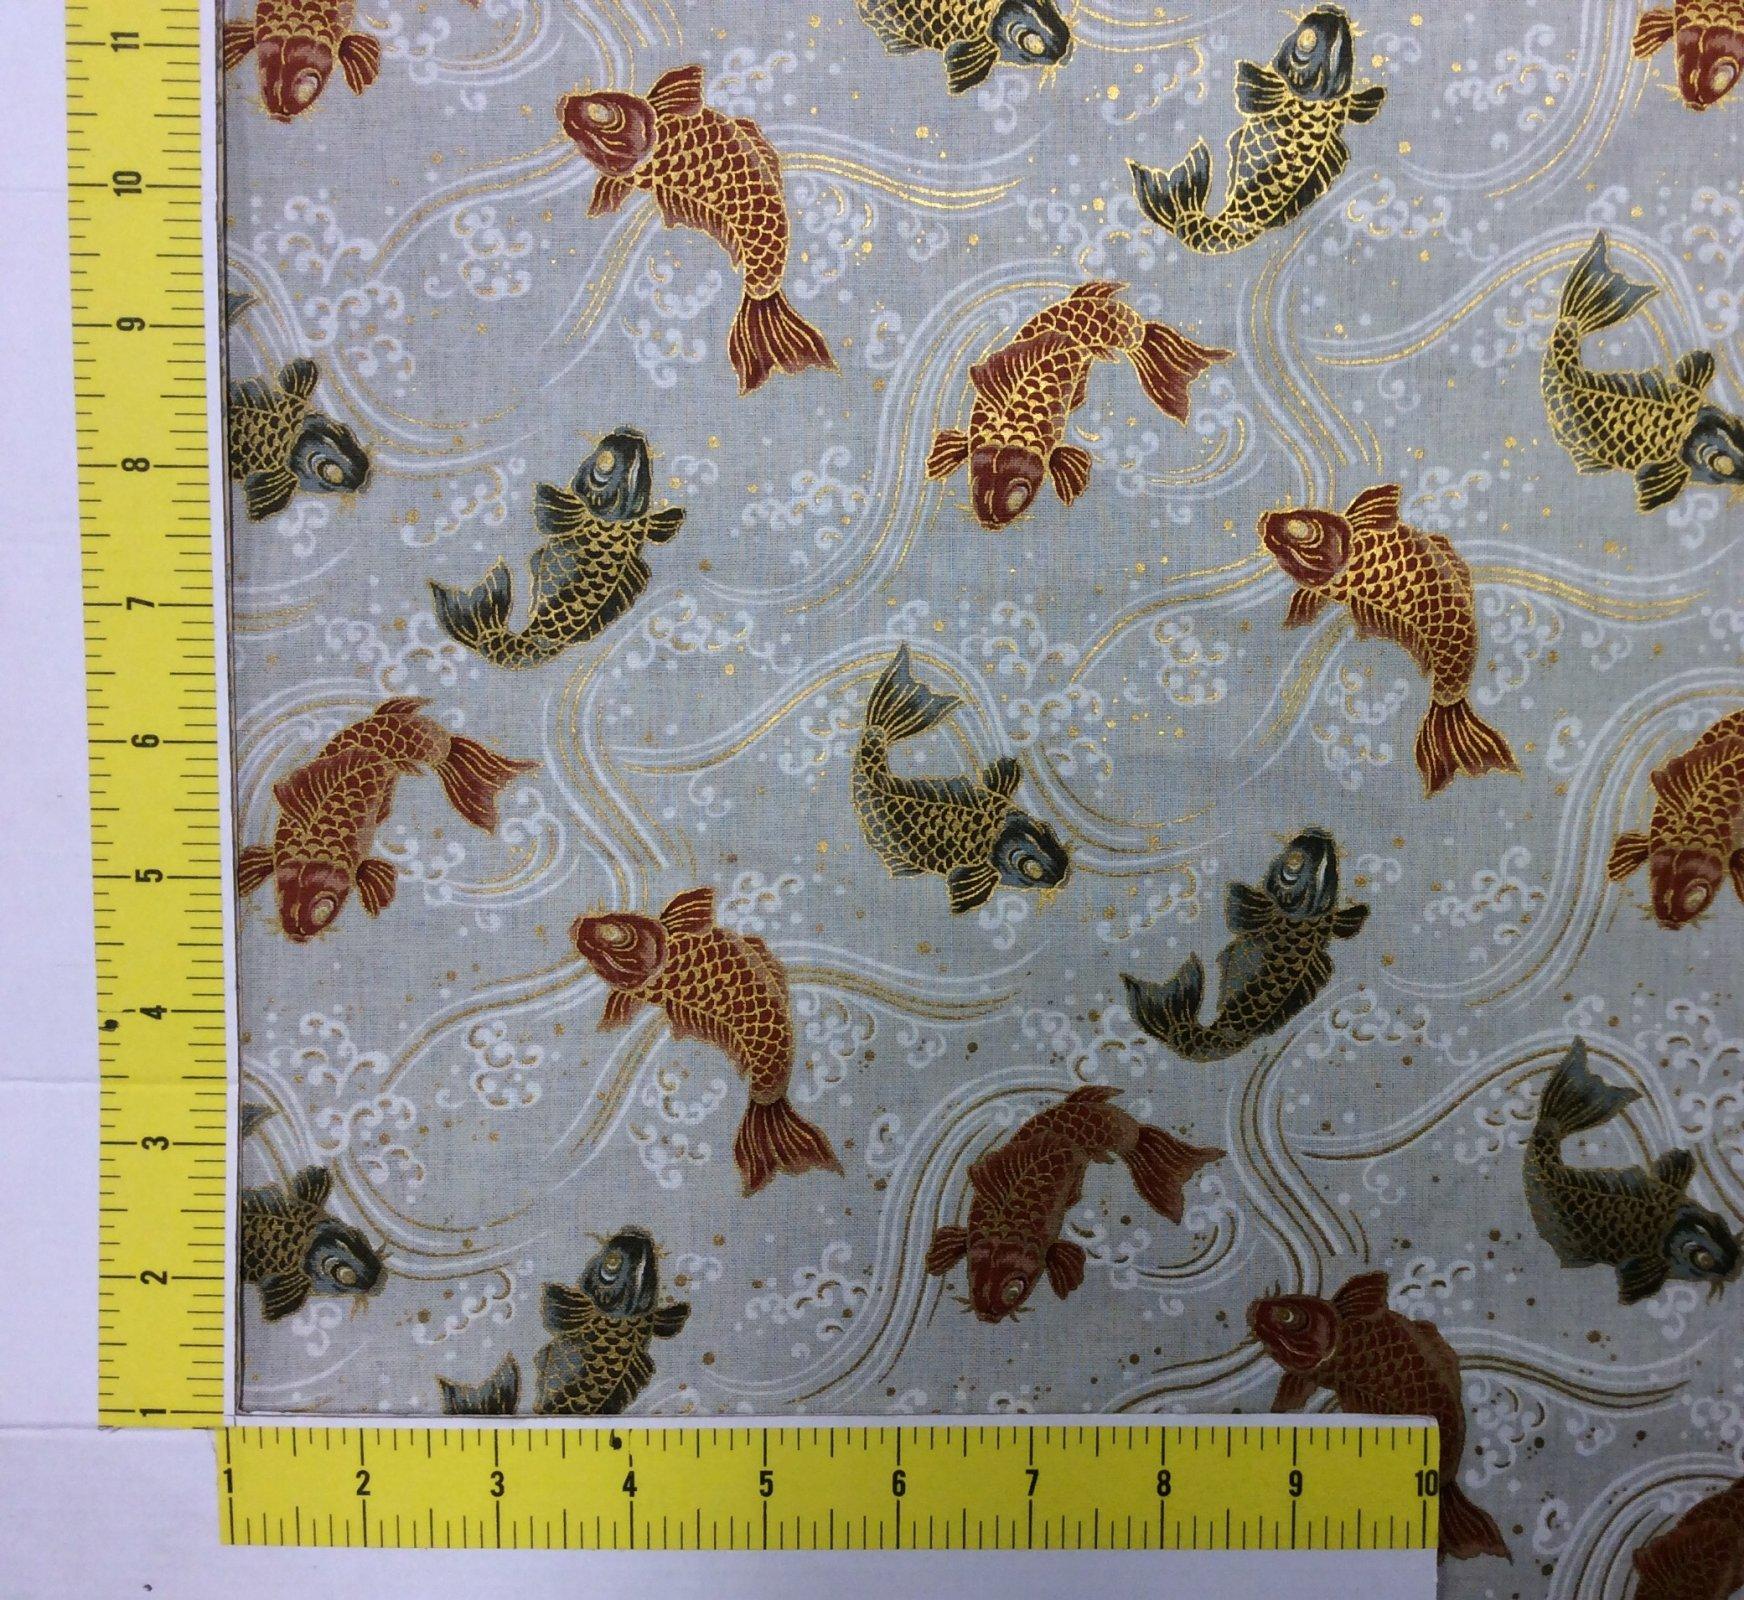 FAT QUARTER! Koi Fish Japanese Asian Kimono Print Cotton Quilt Fabric RPFNT57